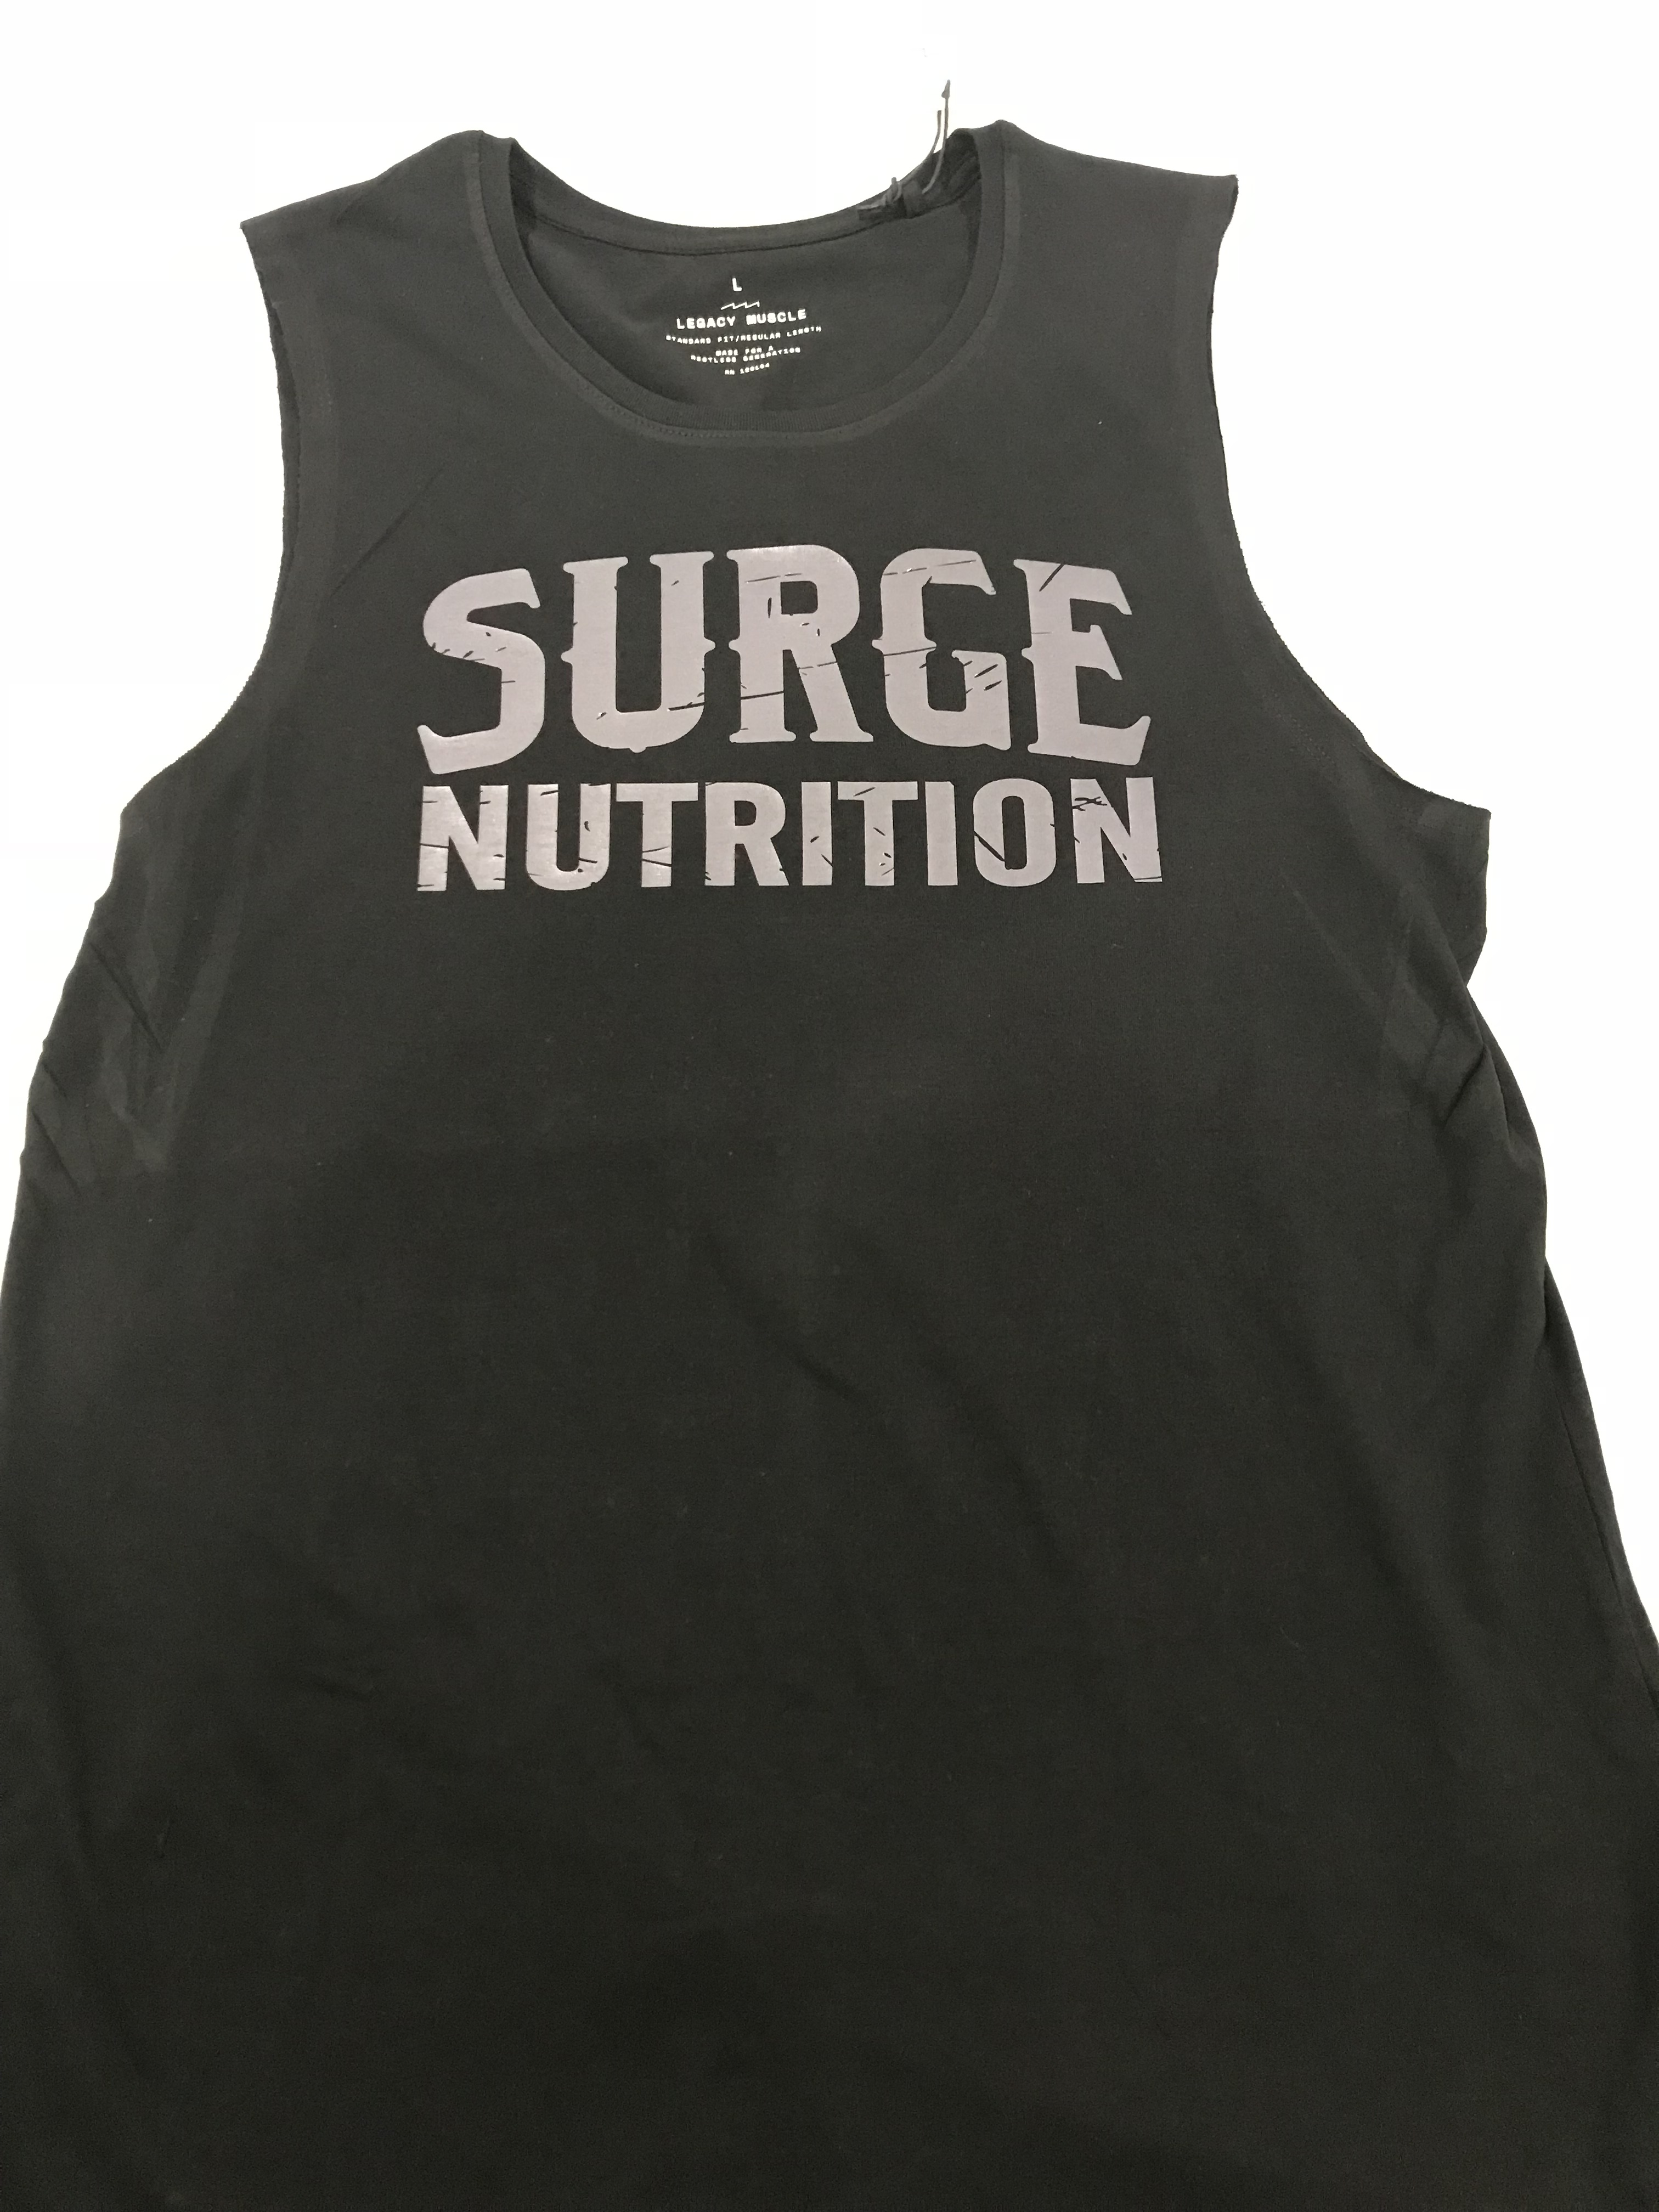 Surge Nutrition Tank Tops